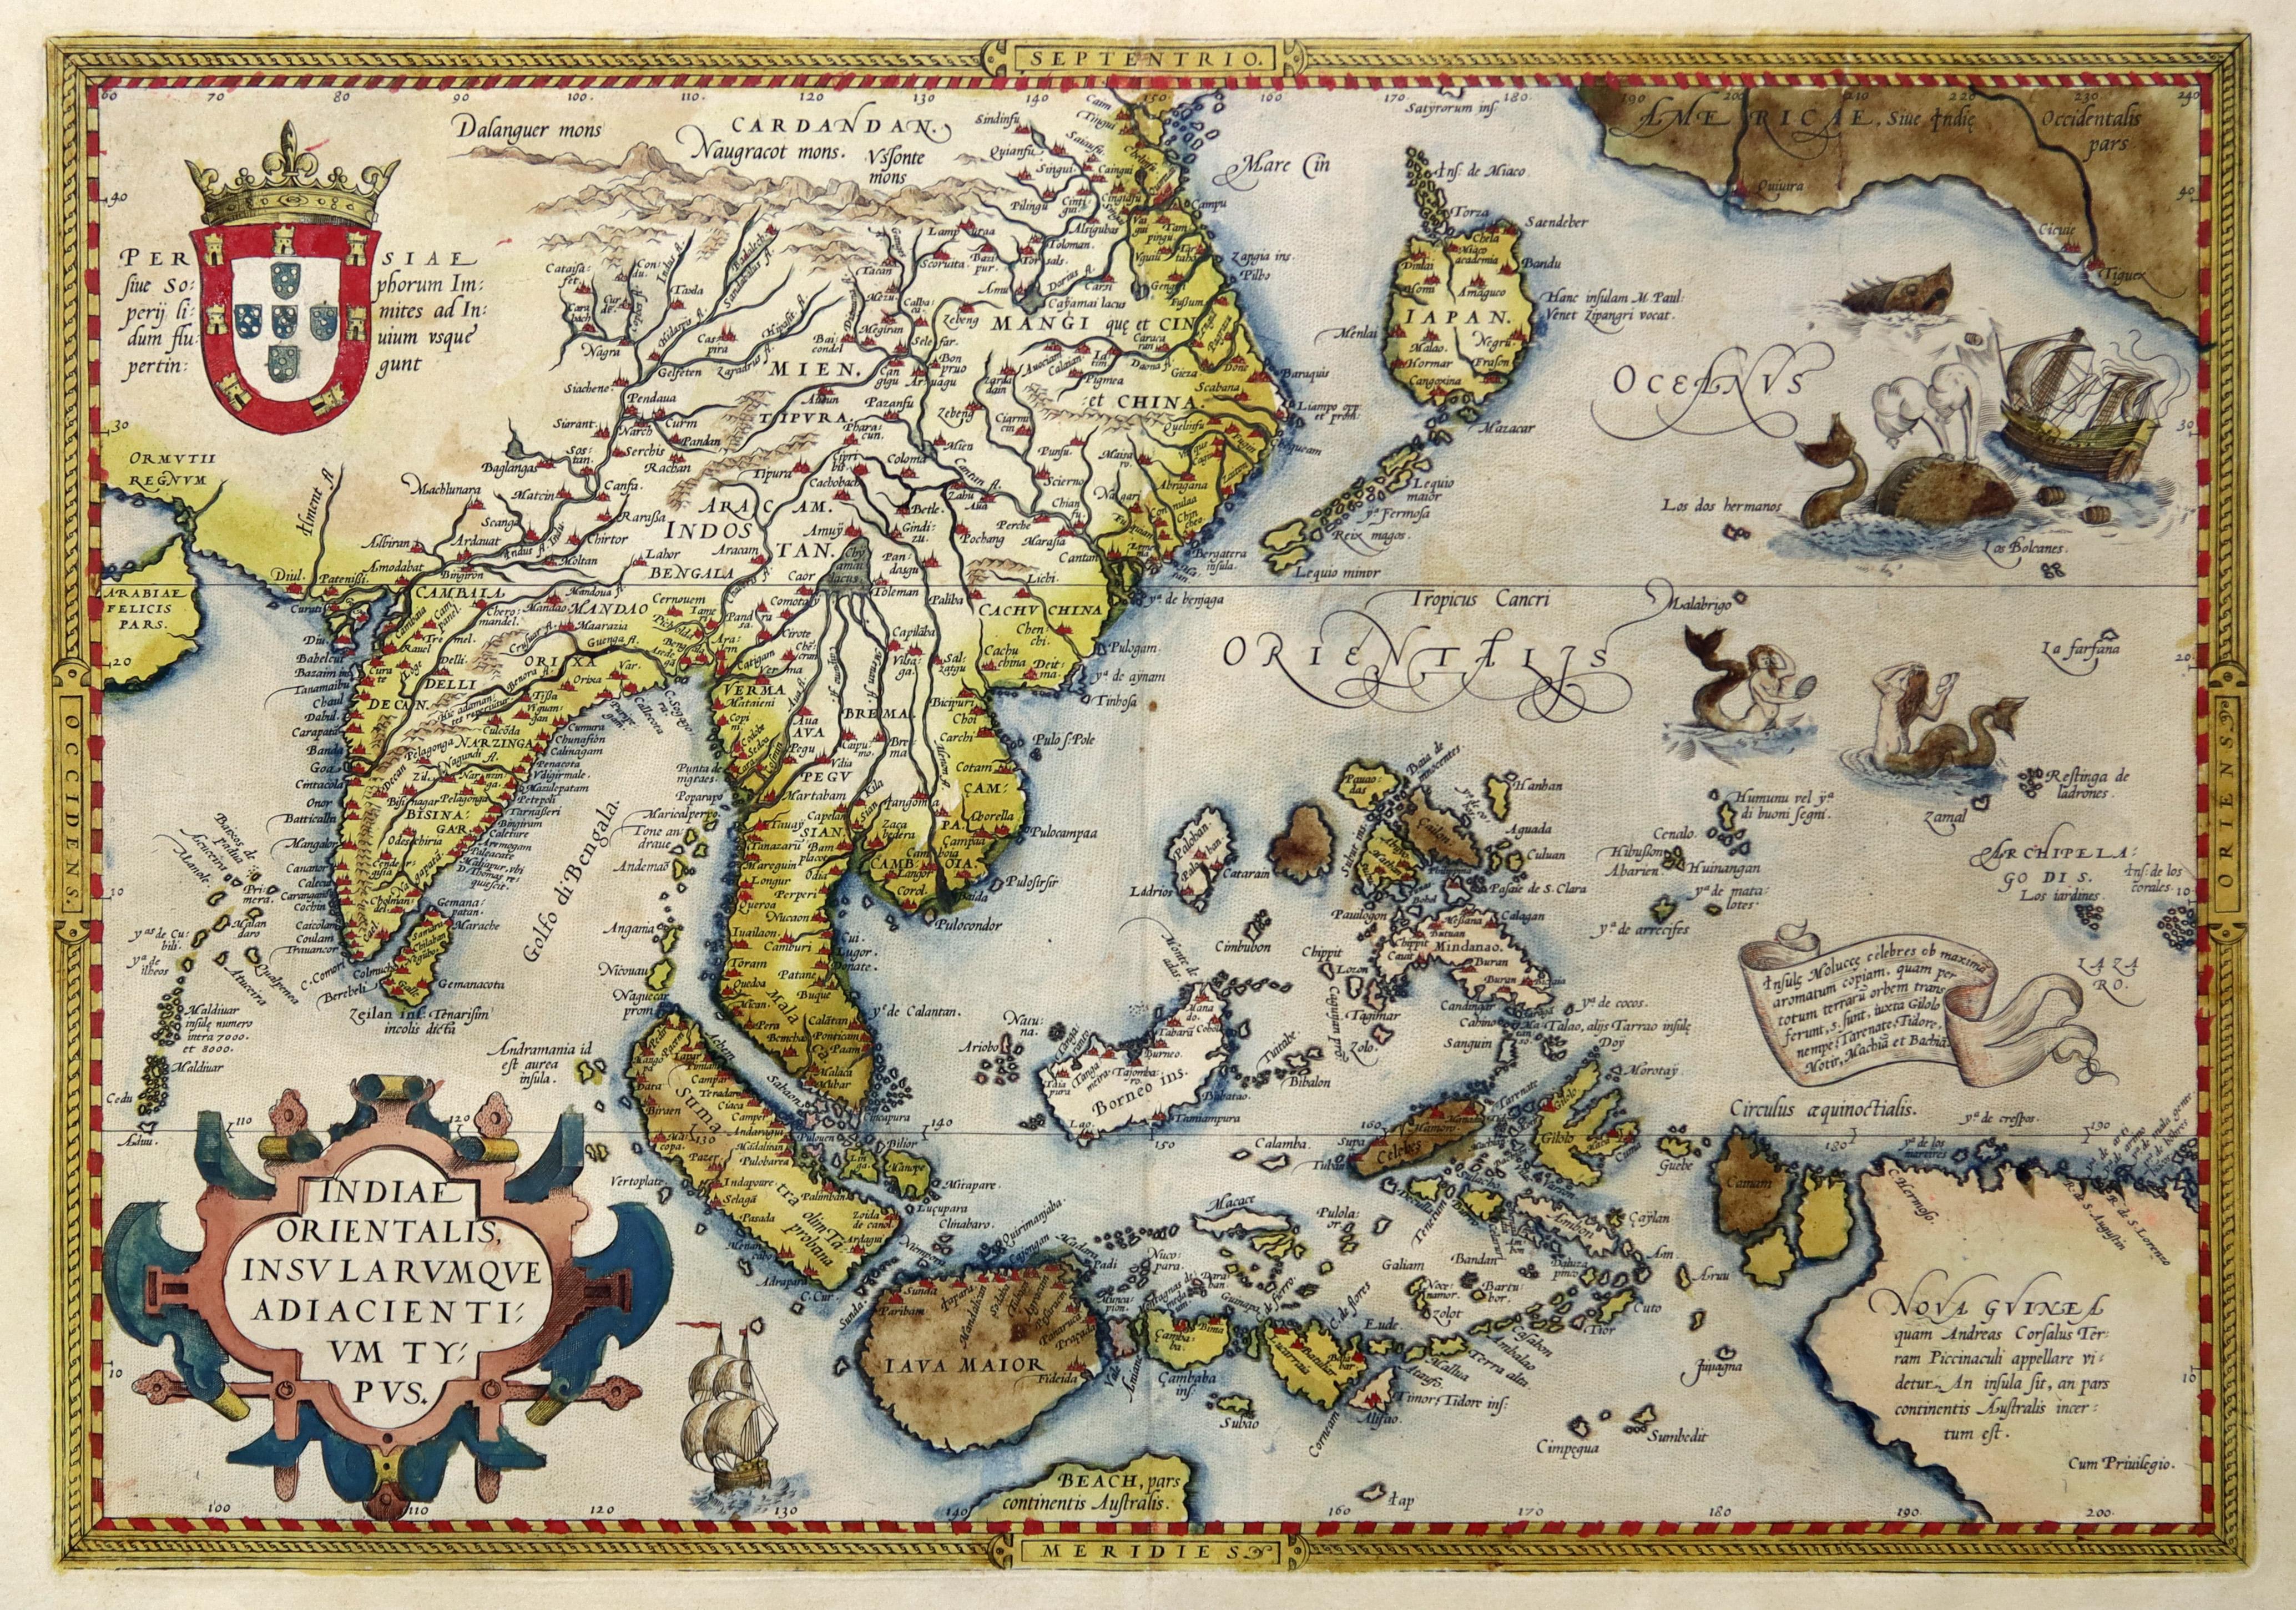 "Kst.- Karte, aus Ortelius, ""Indiae orientalis, insvlarvmqve: Indien - Südostasien"